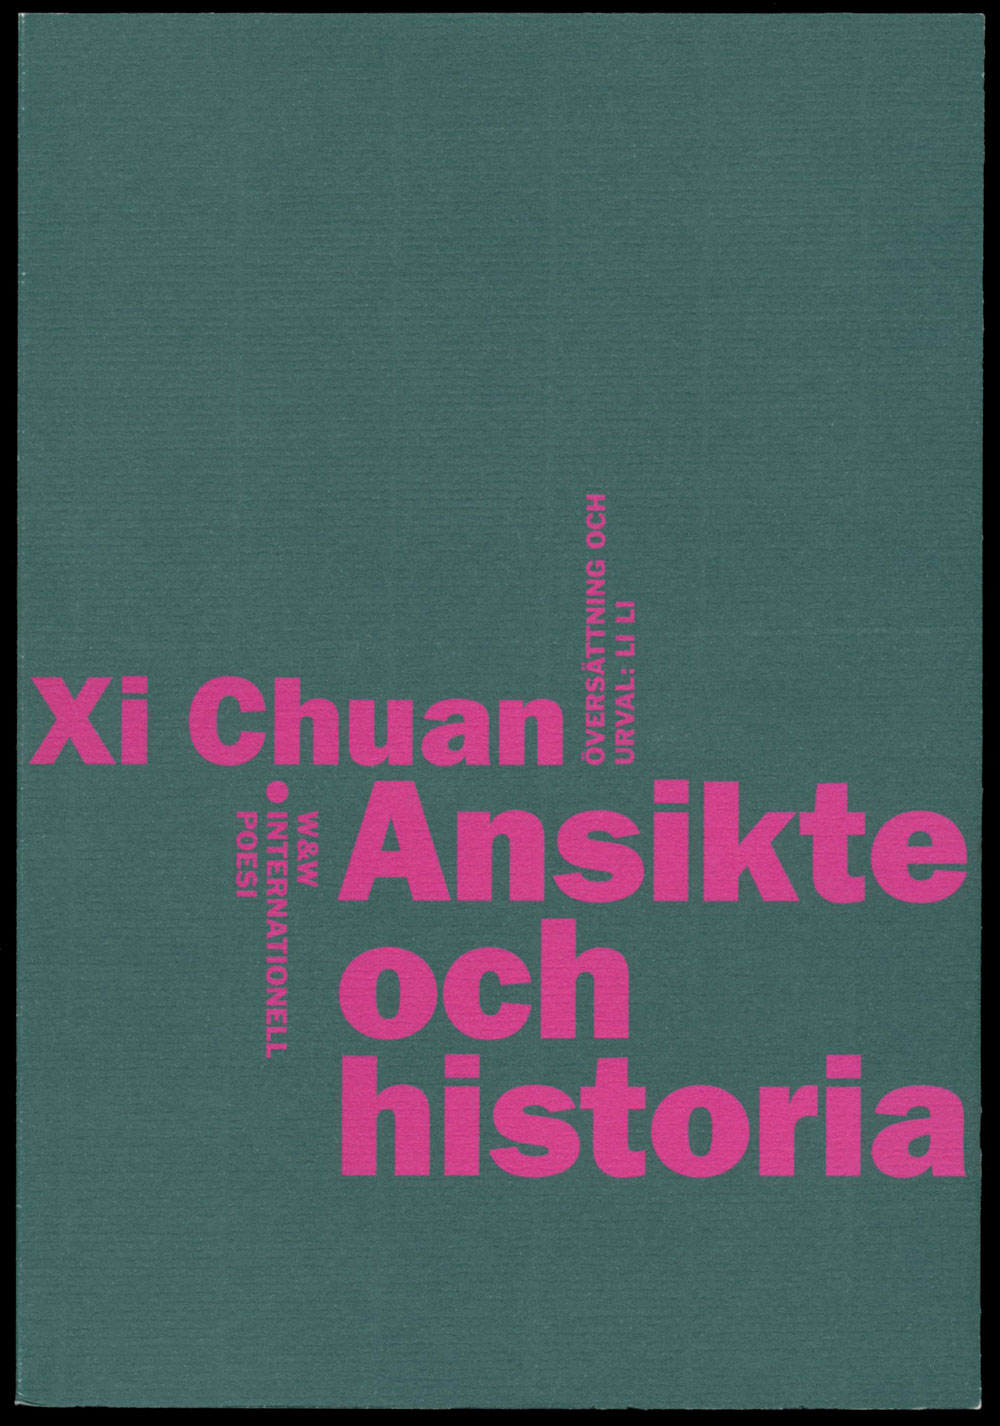 Xi Chuan Ansikte och historia Wahlström & Widstrands serie med internationell poesi